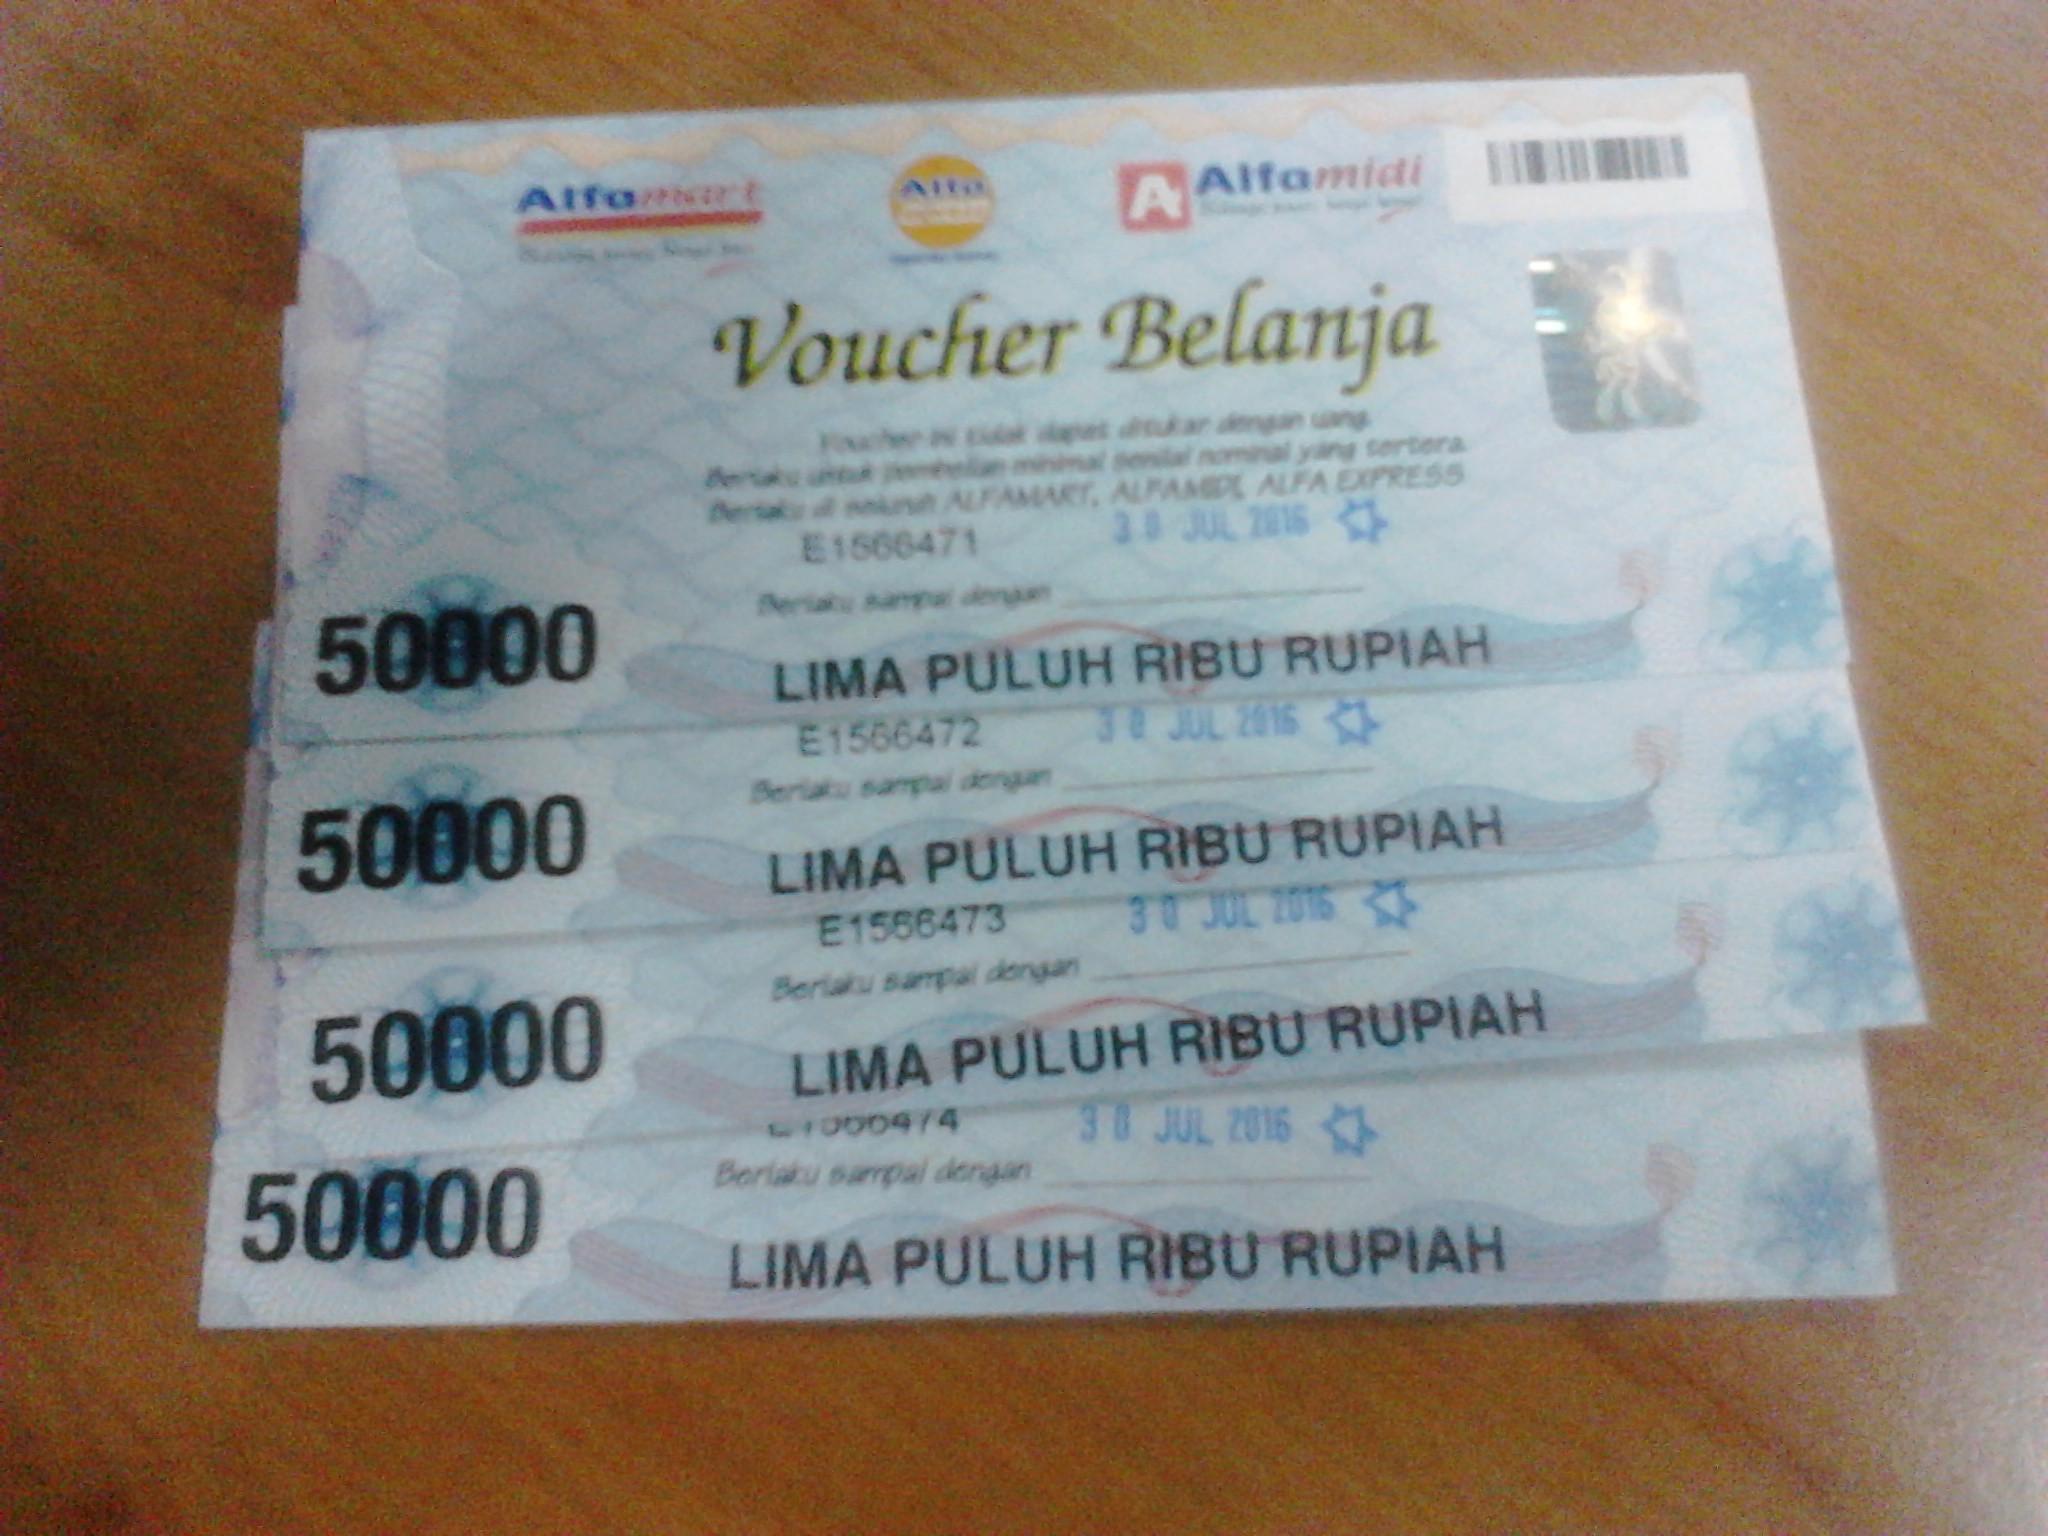 Jual Voucher Alfamart Toserba Naura Tokopedia 50000